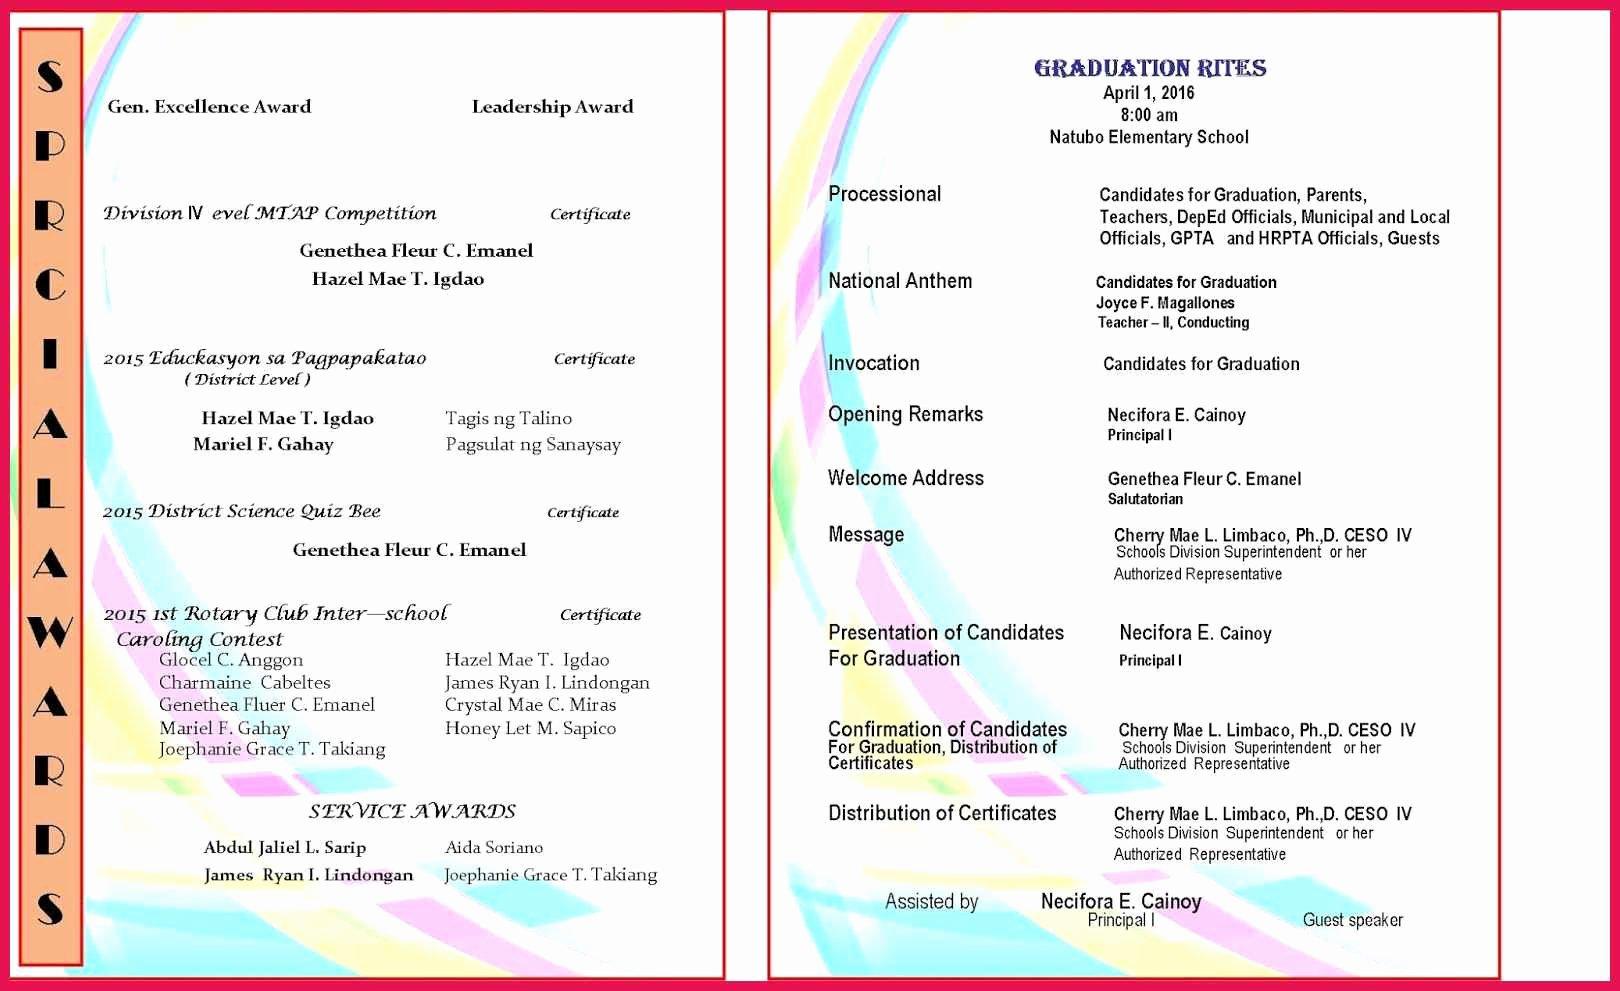 Graduation Ceremony Program Template Lovely Graduation Program Template